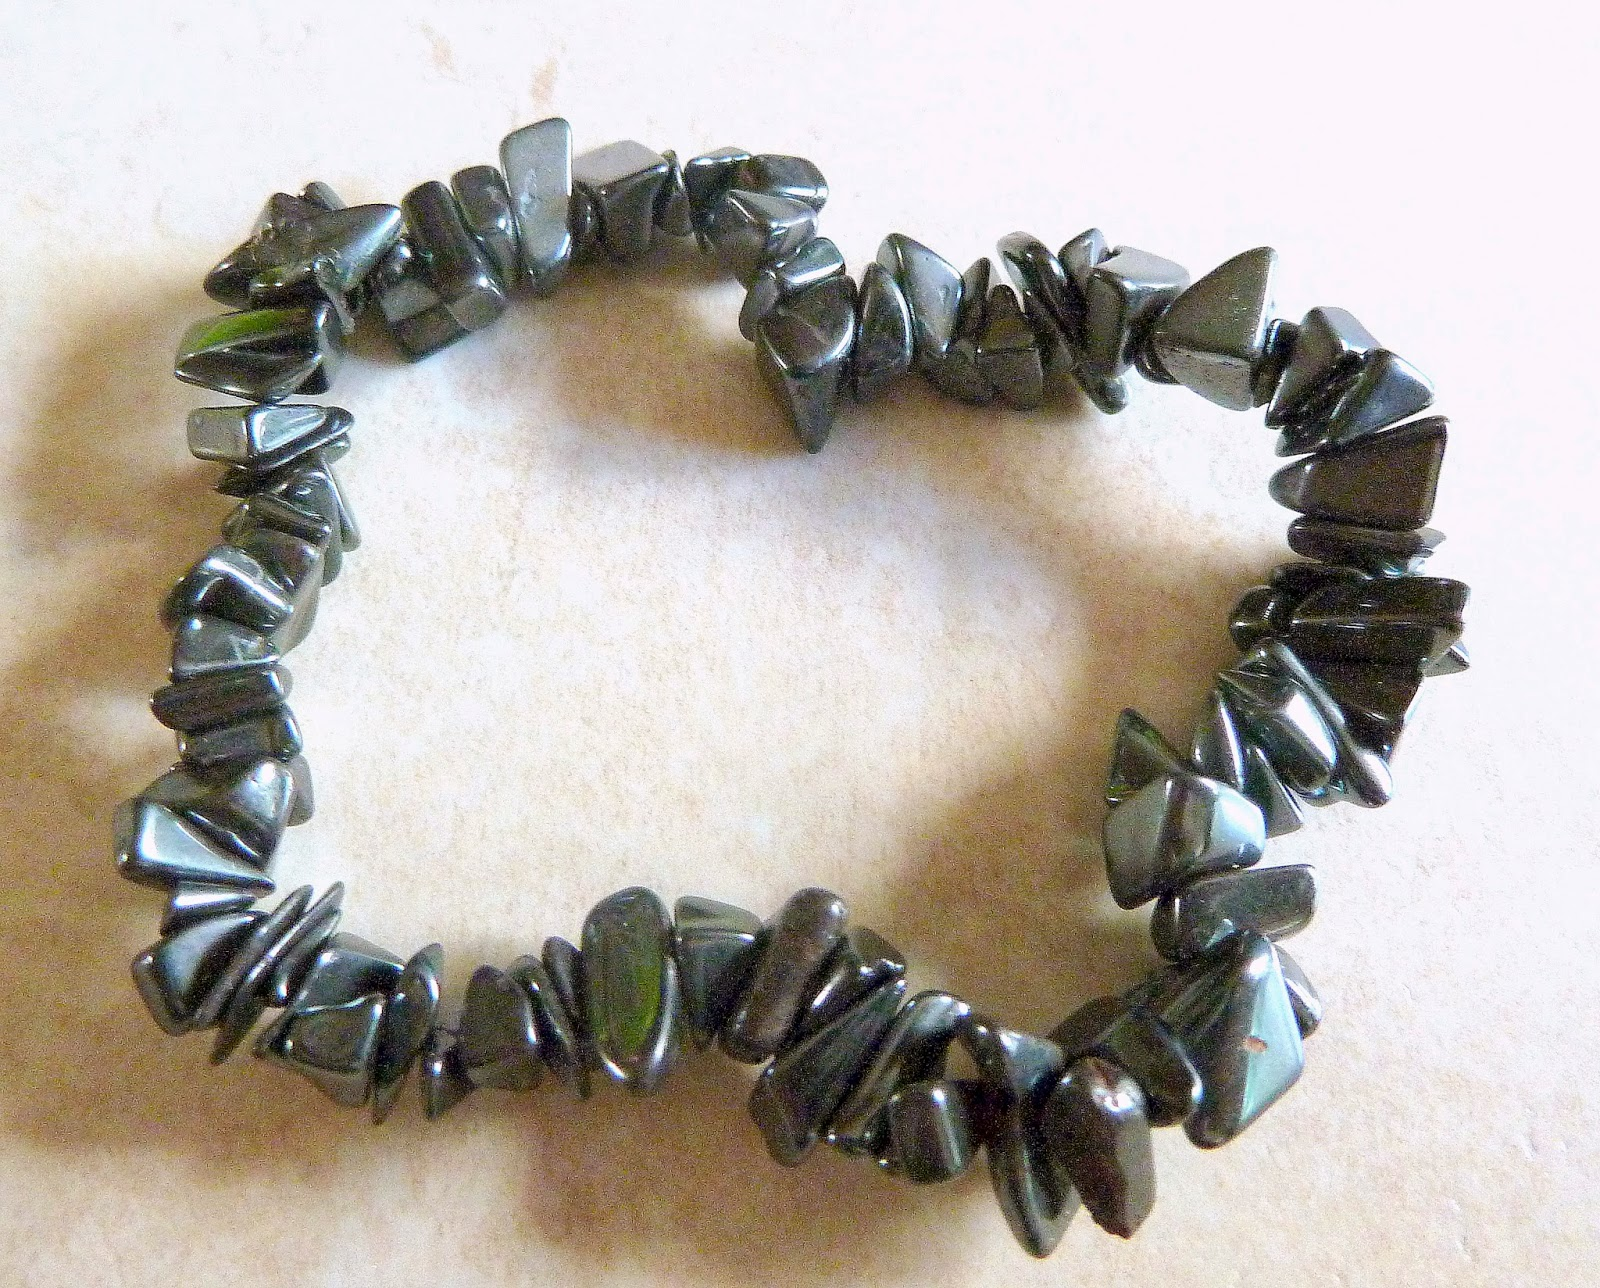 http://www.kcavintagegems.uk/hematite-chip-bracelet-402-p.asp